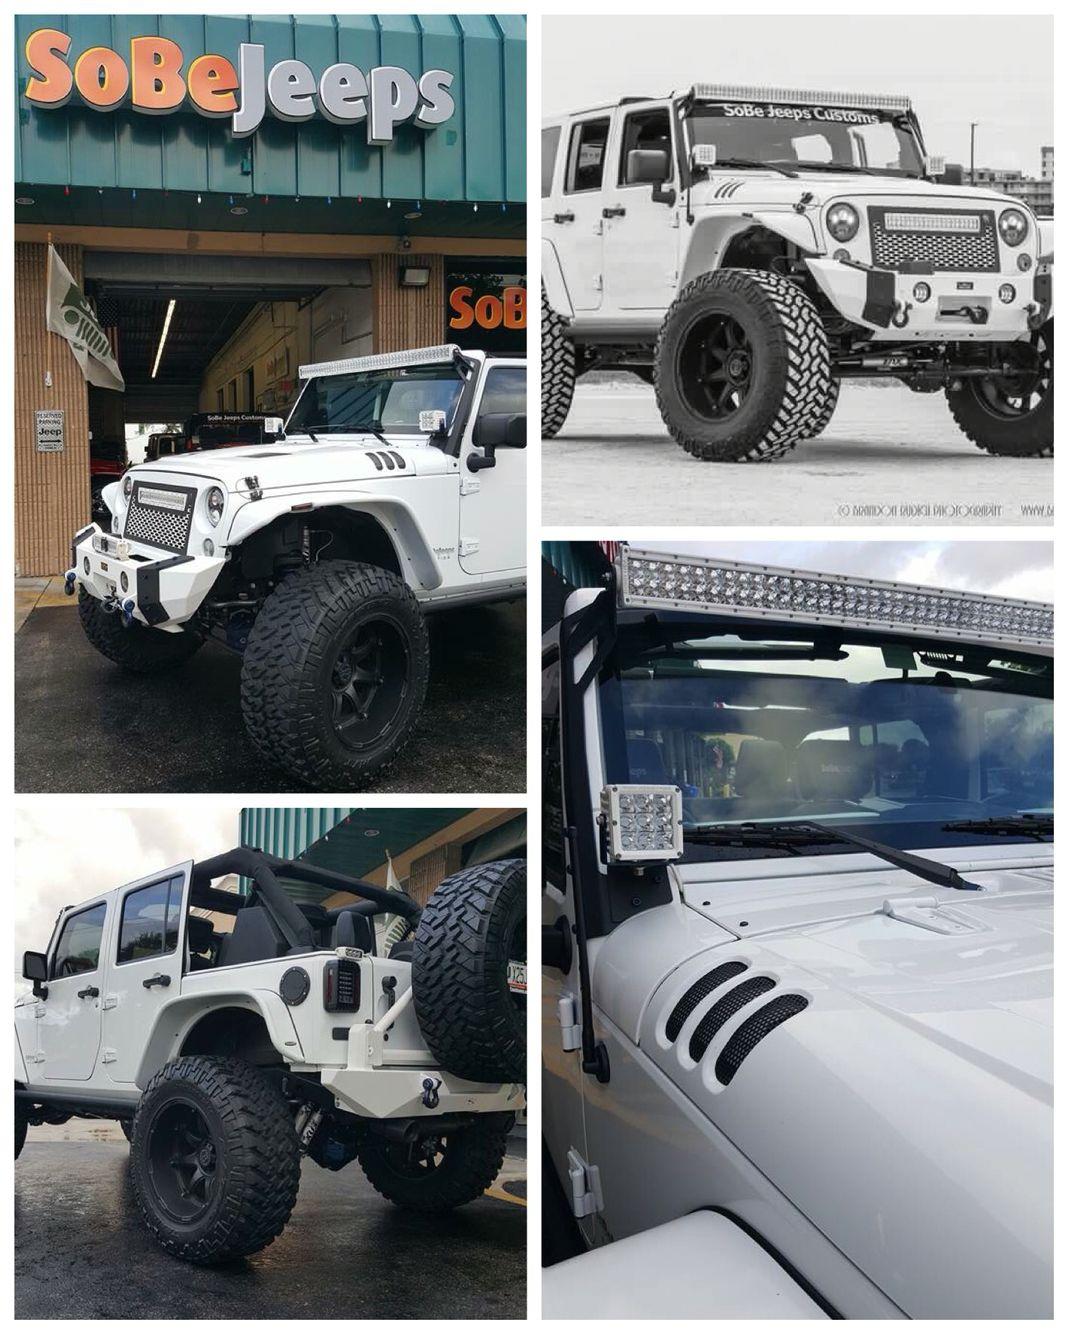 Pin By Sobe Jeeps On Sobe Jeeps Custom Jeep Wranglers Custom Jeep Wrangler Custom Jeep